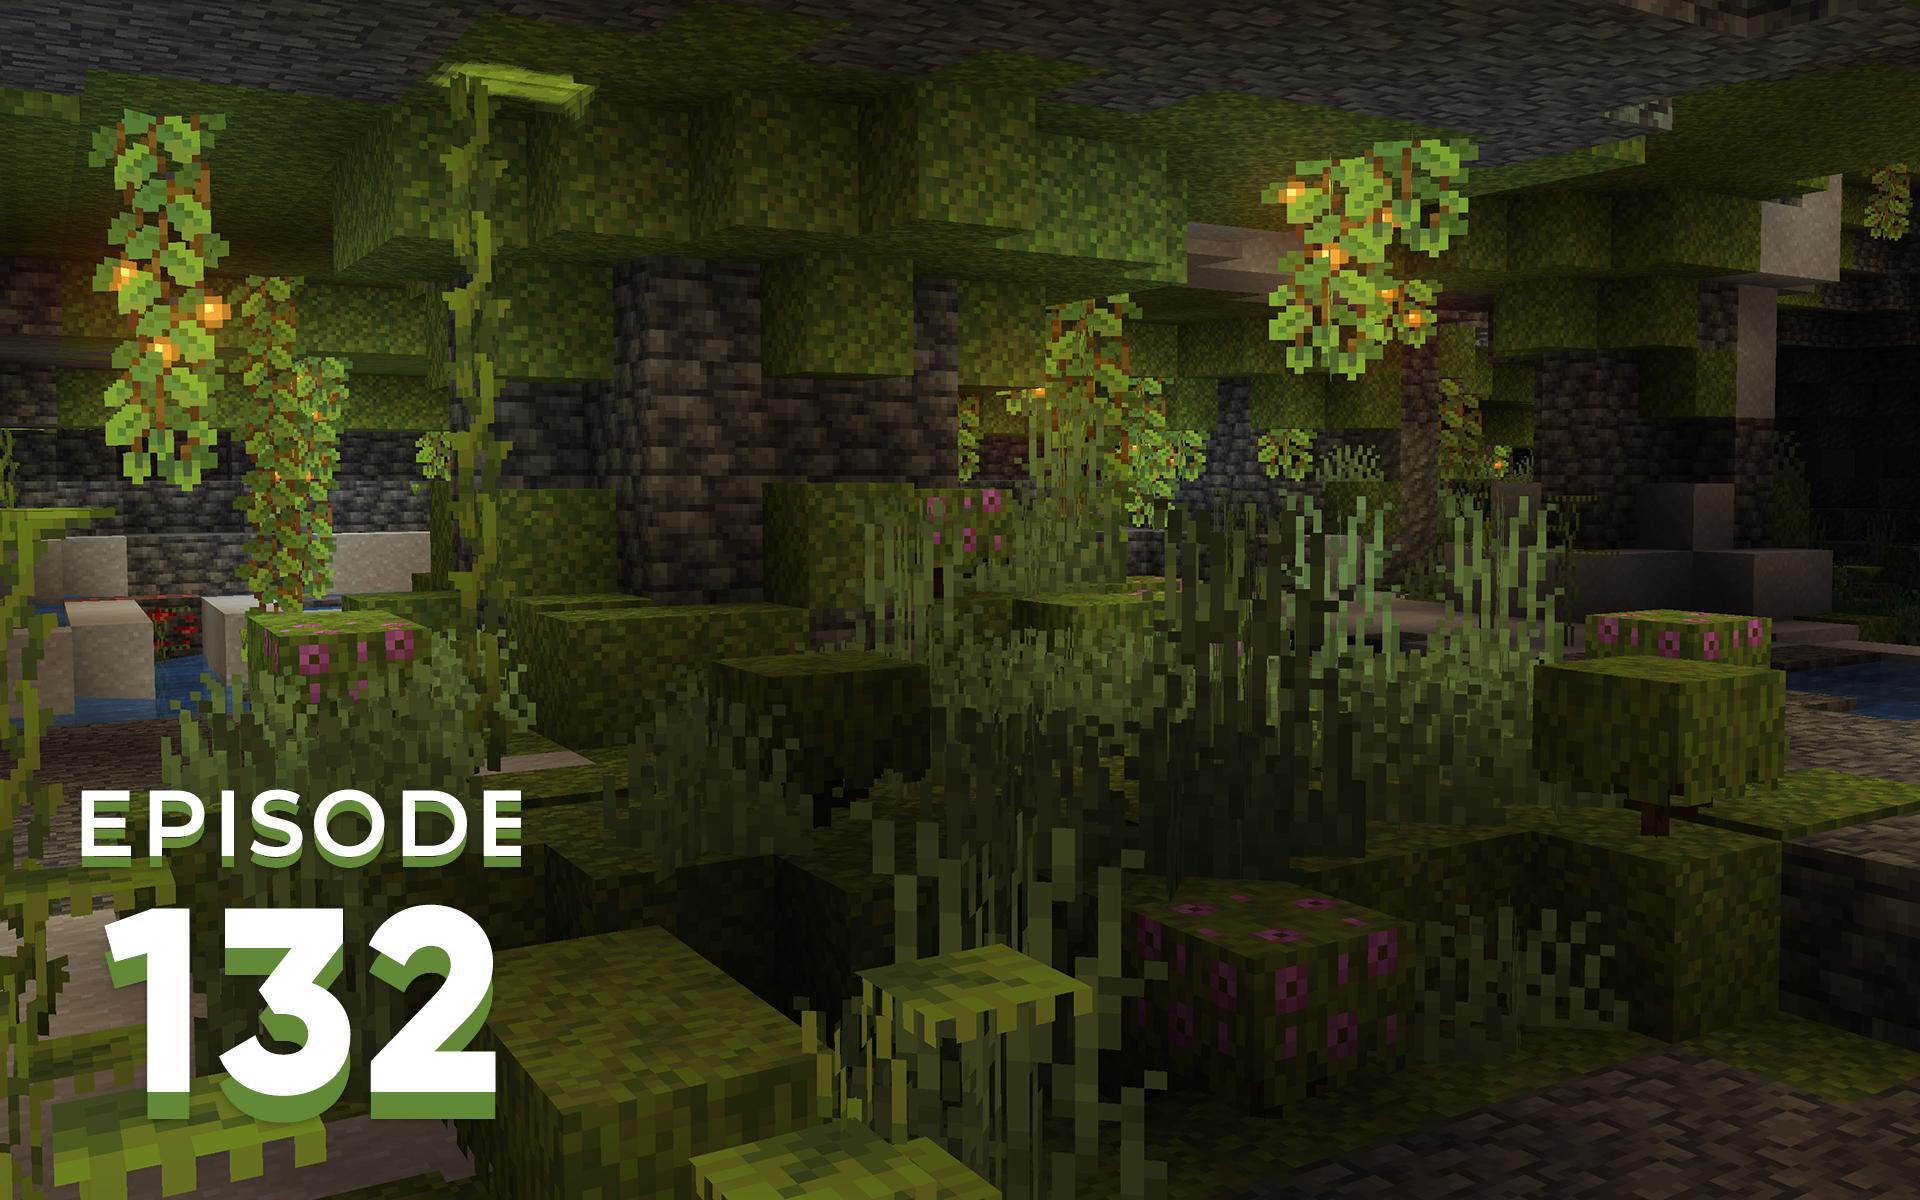 The Spawn Chunks 132: Rushing Into Lush Caves